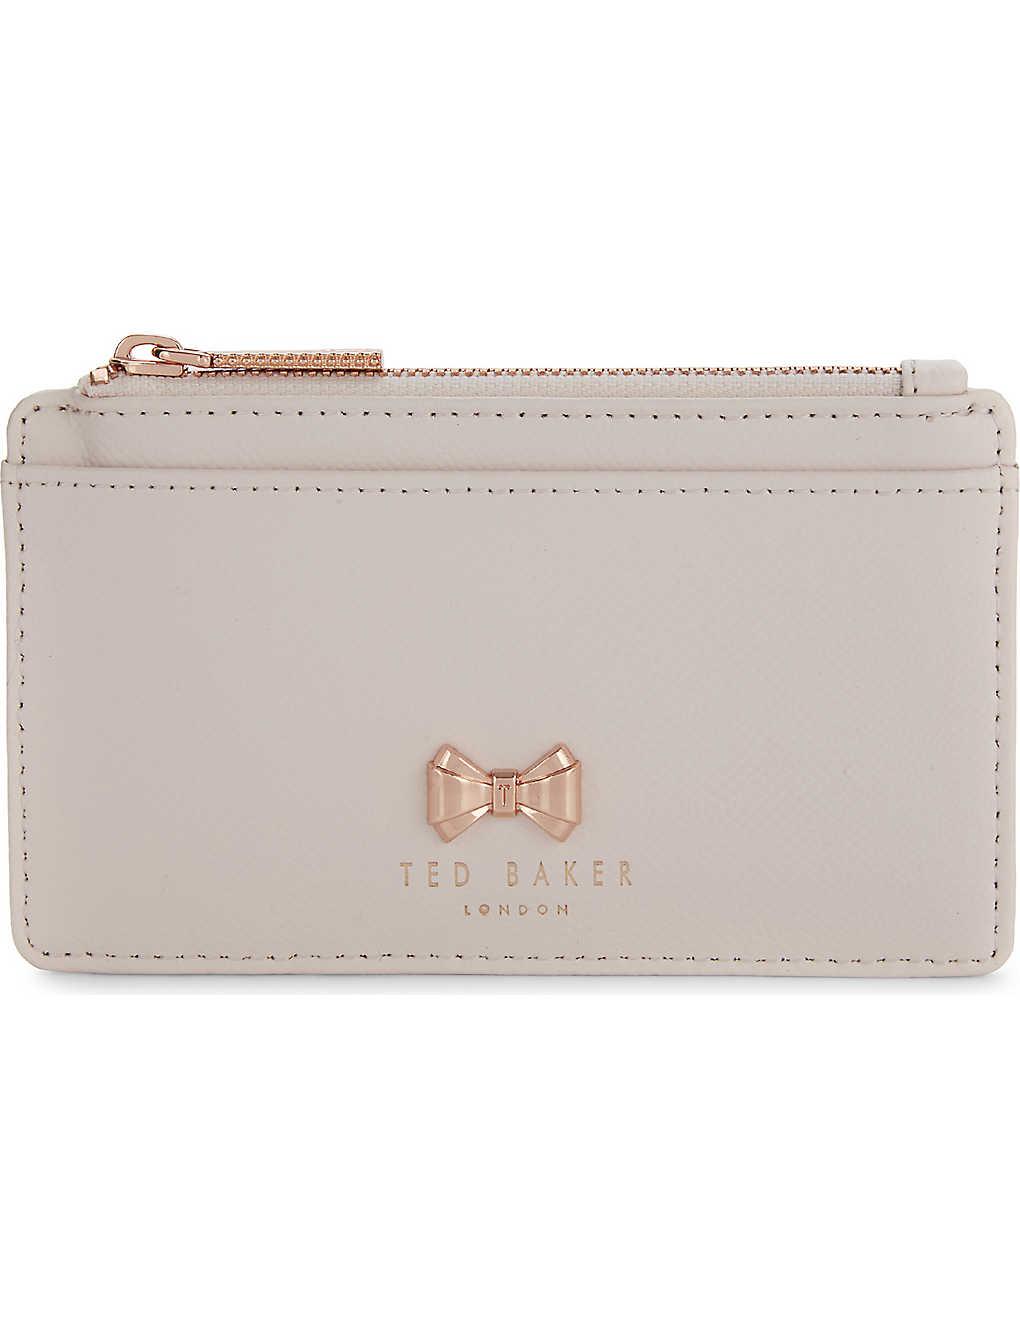 9b6be5c68 TED BAKER - Satinii mini bow leather purse | Selfridges.com